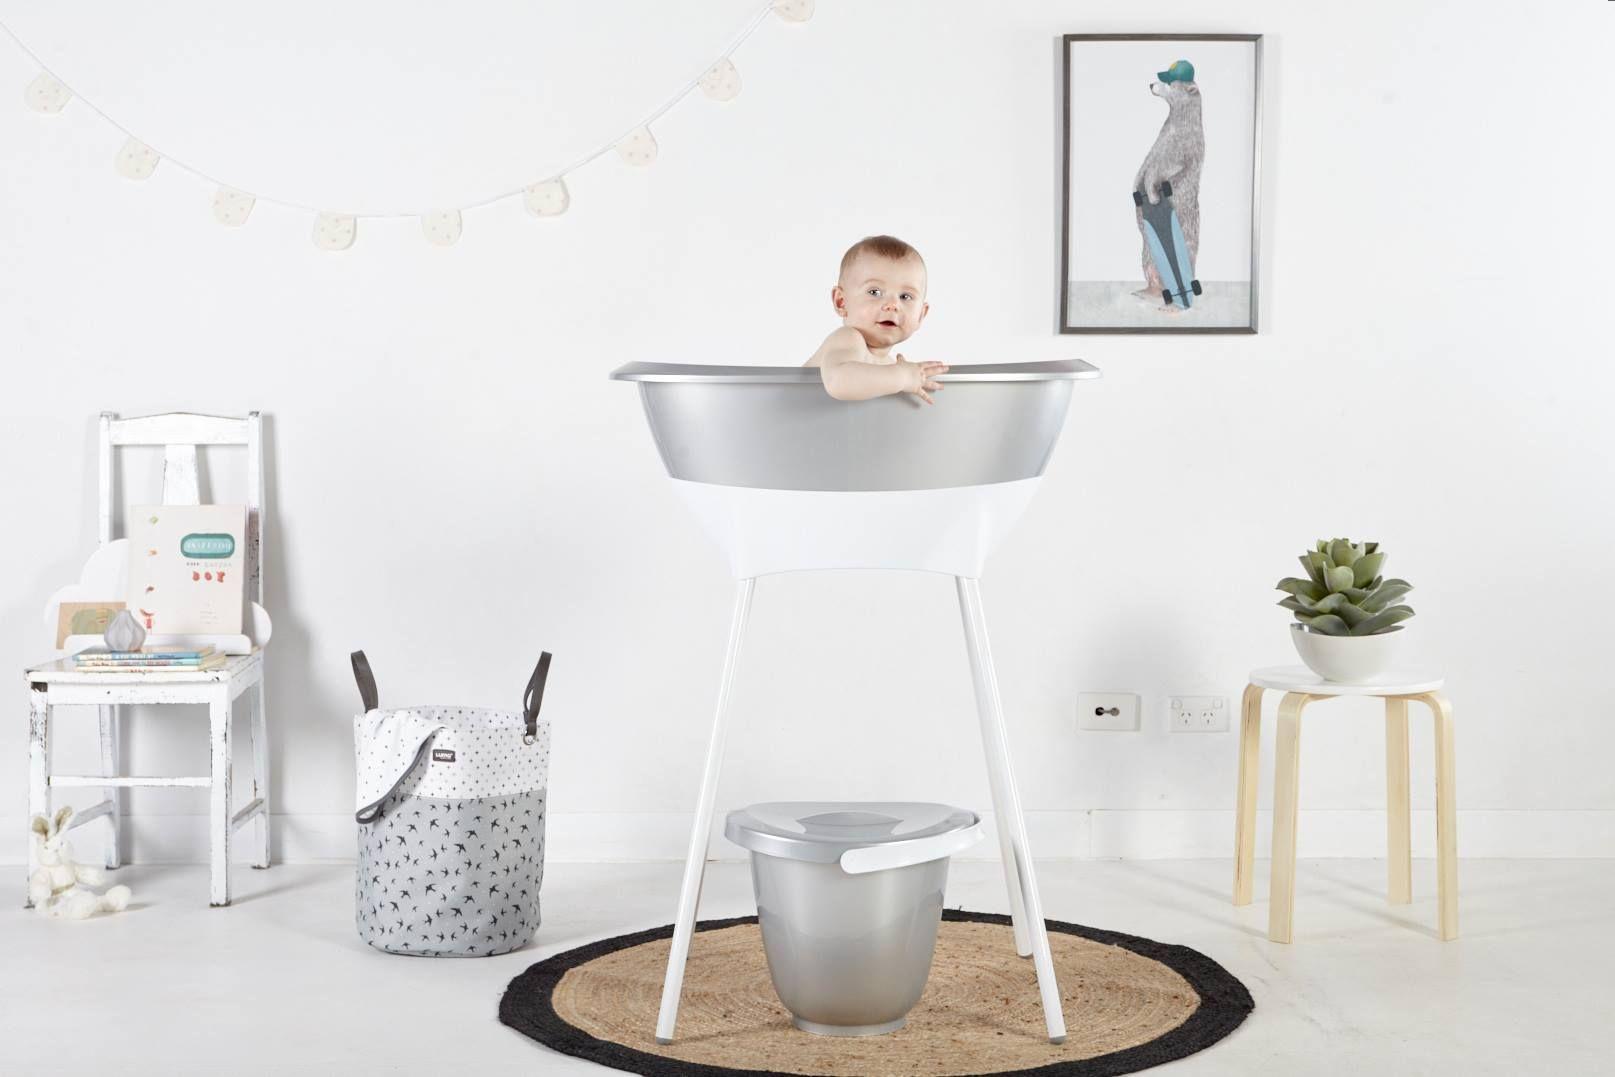 Luma Bash Mpanioy Metallikh Snow White 78cm Baby Lumababycare Babycare Nursery Babybath Baby Room Home Decor Decor